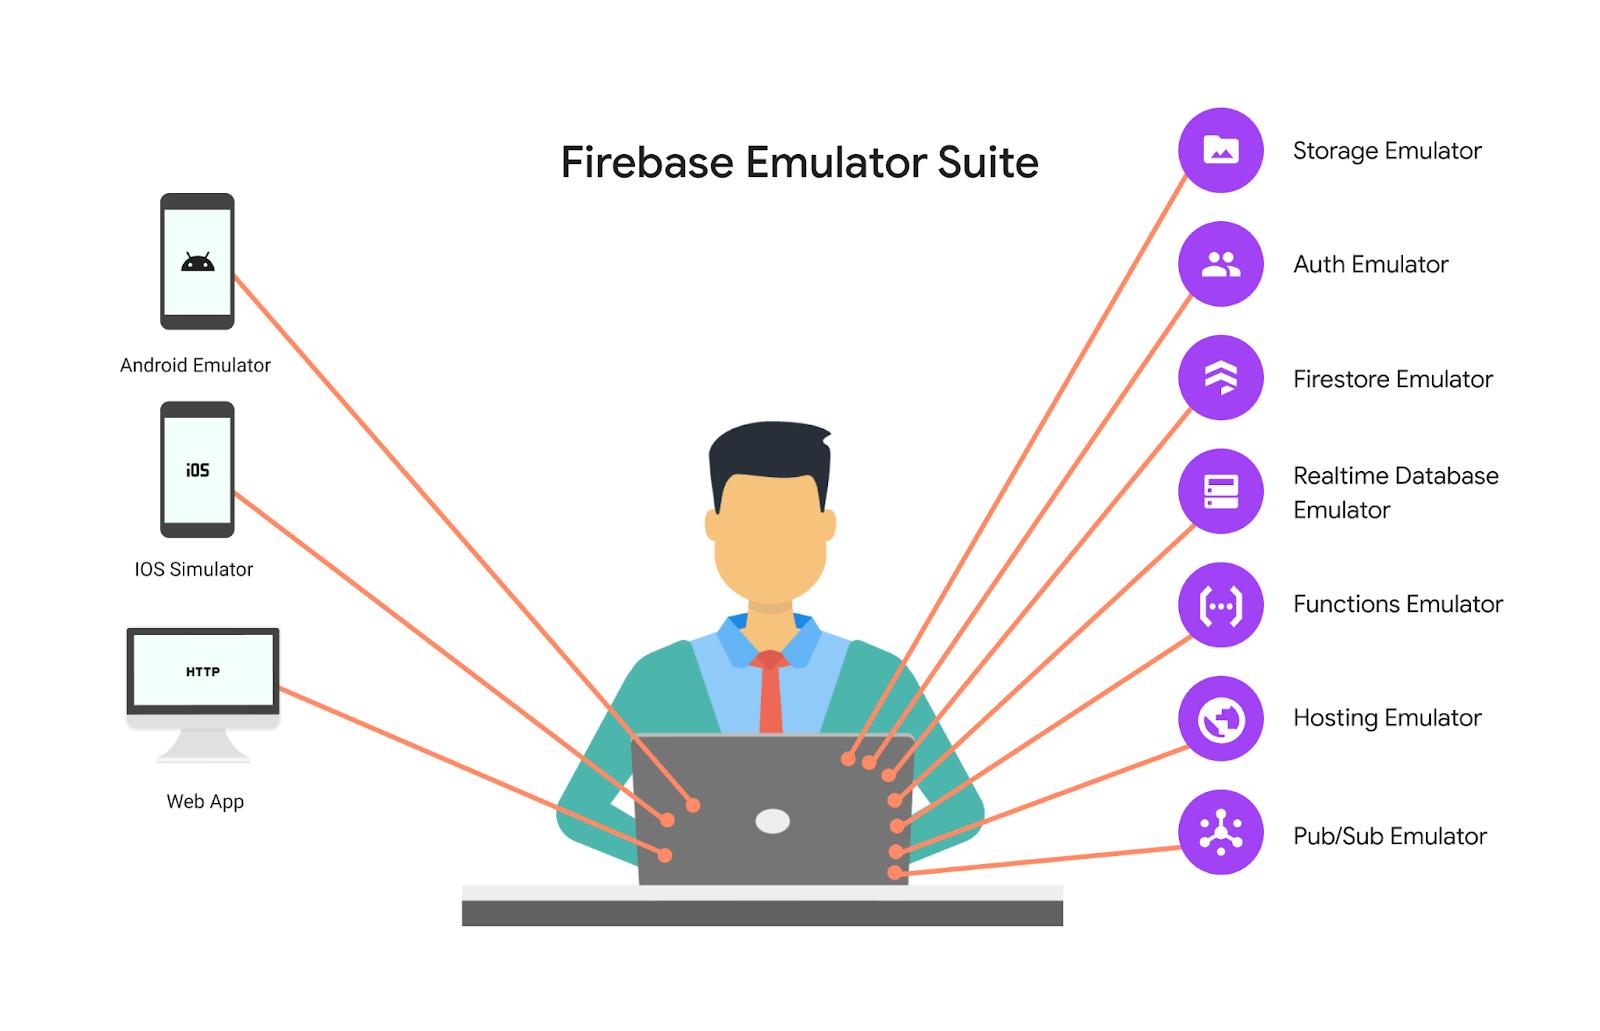 Animation of the Firebase Emulator Suite